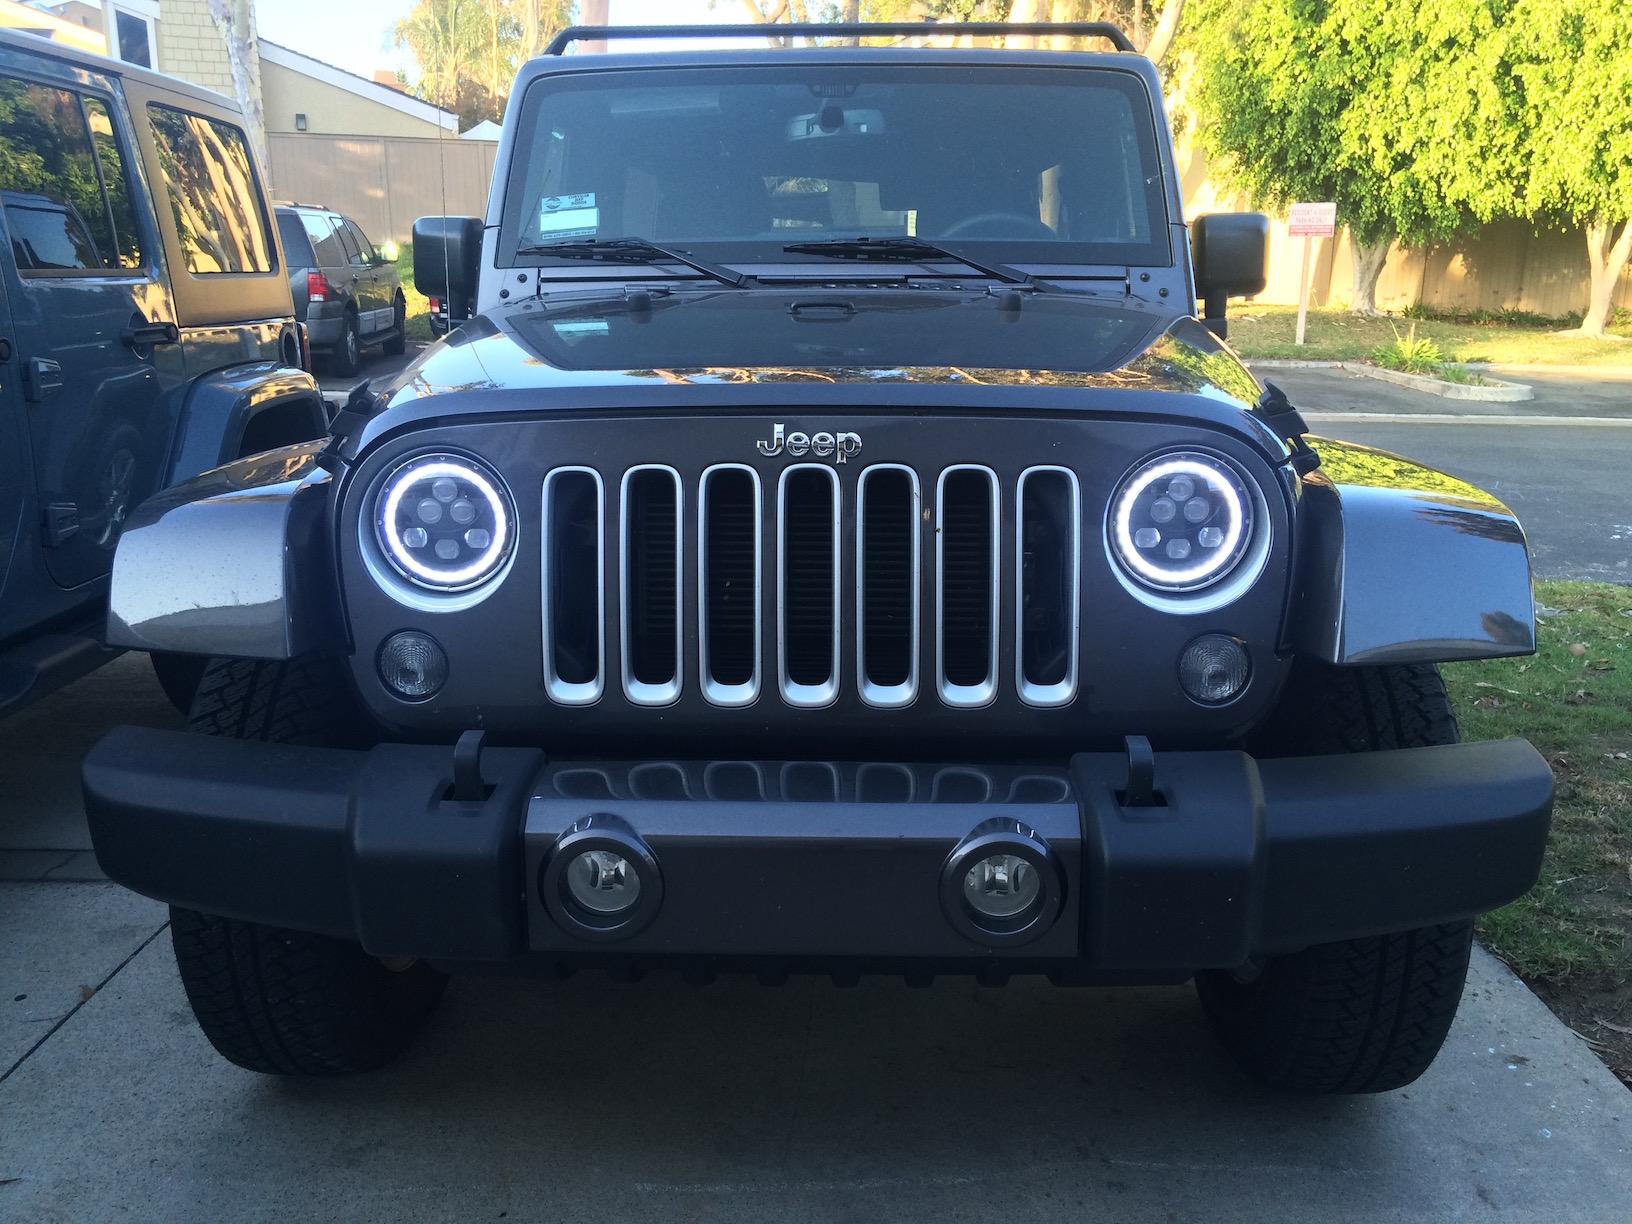 Halo Lights For Jeep Wrangler >> Led Halo Headlights Installed On Jeep Wrangler Jku Beach